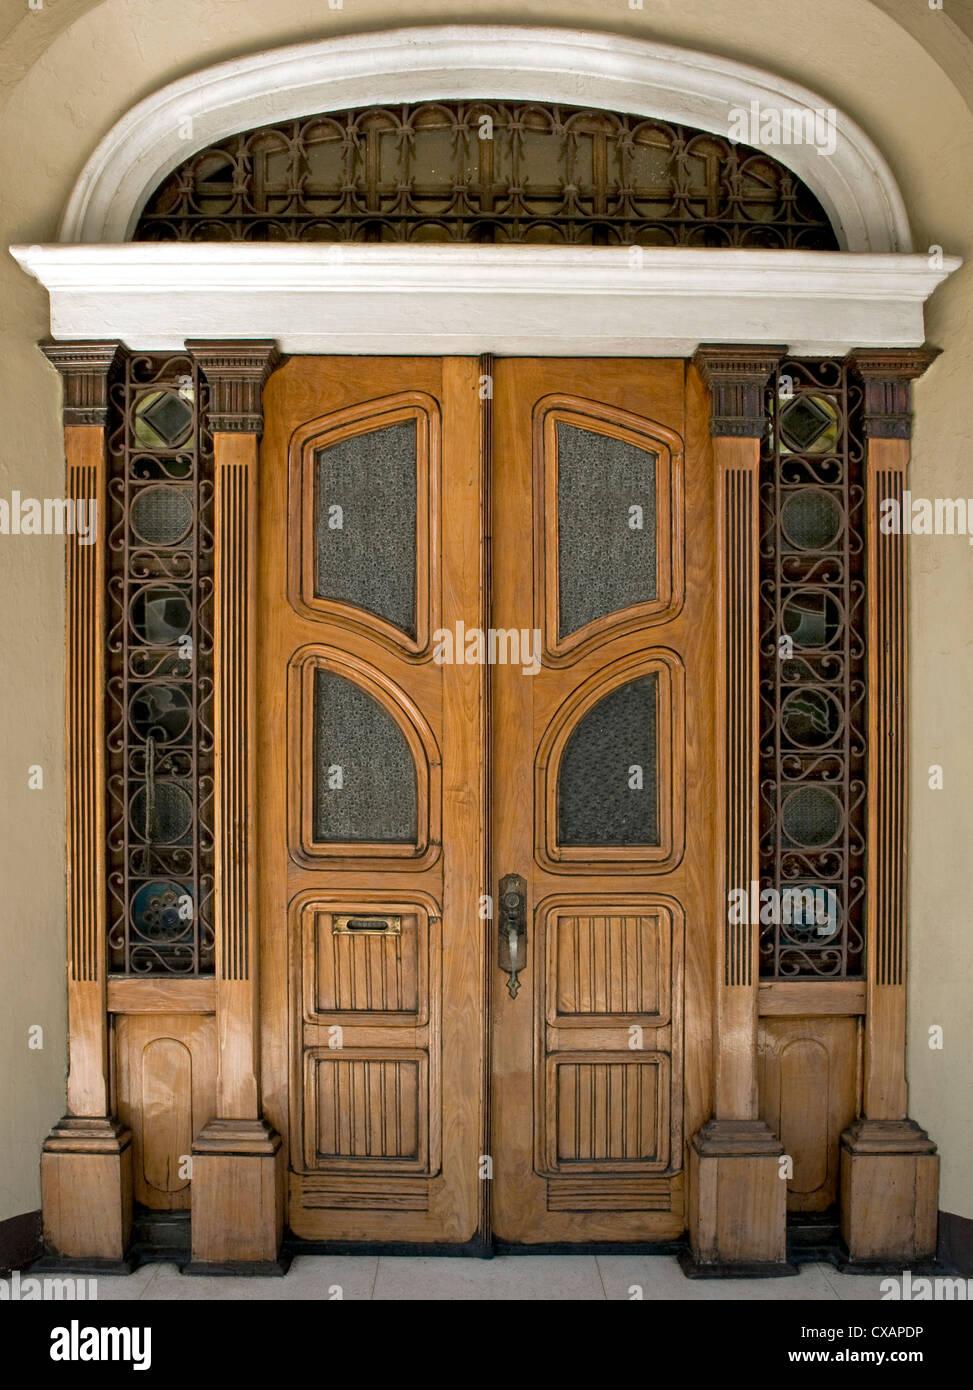 La puerta de estilo Art Nouveau, Iloilo, Filipinas, el sudeste de Asia, Asia Imagen De Stock